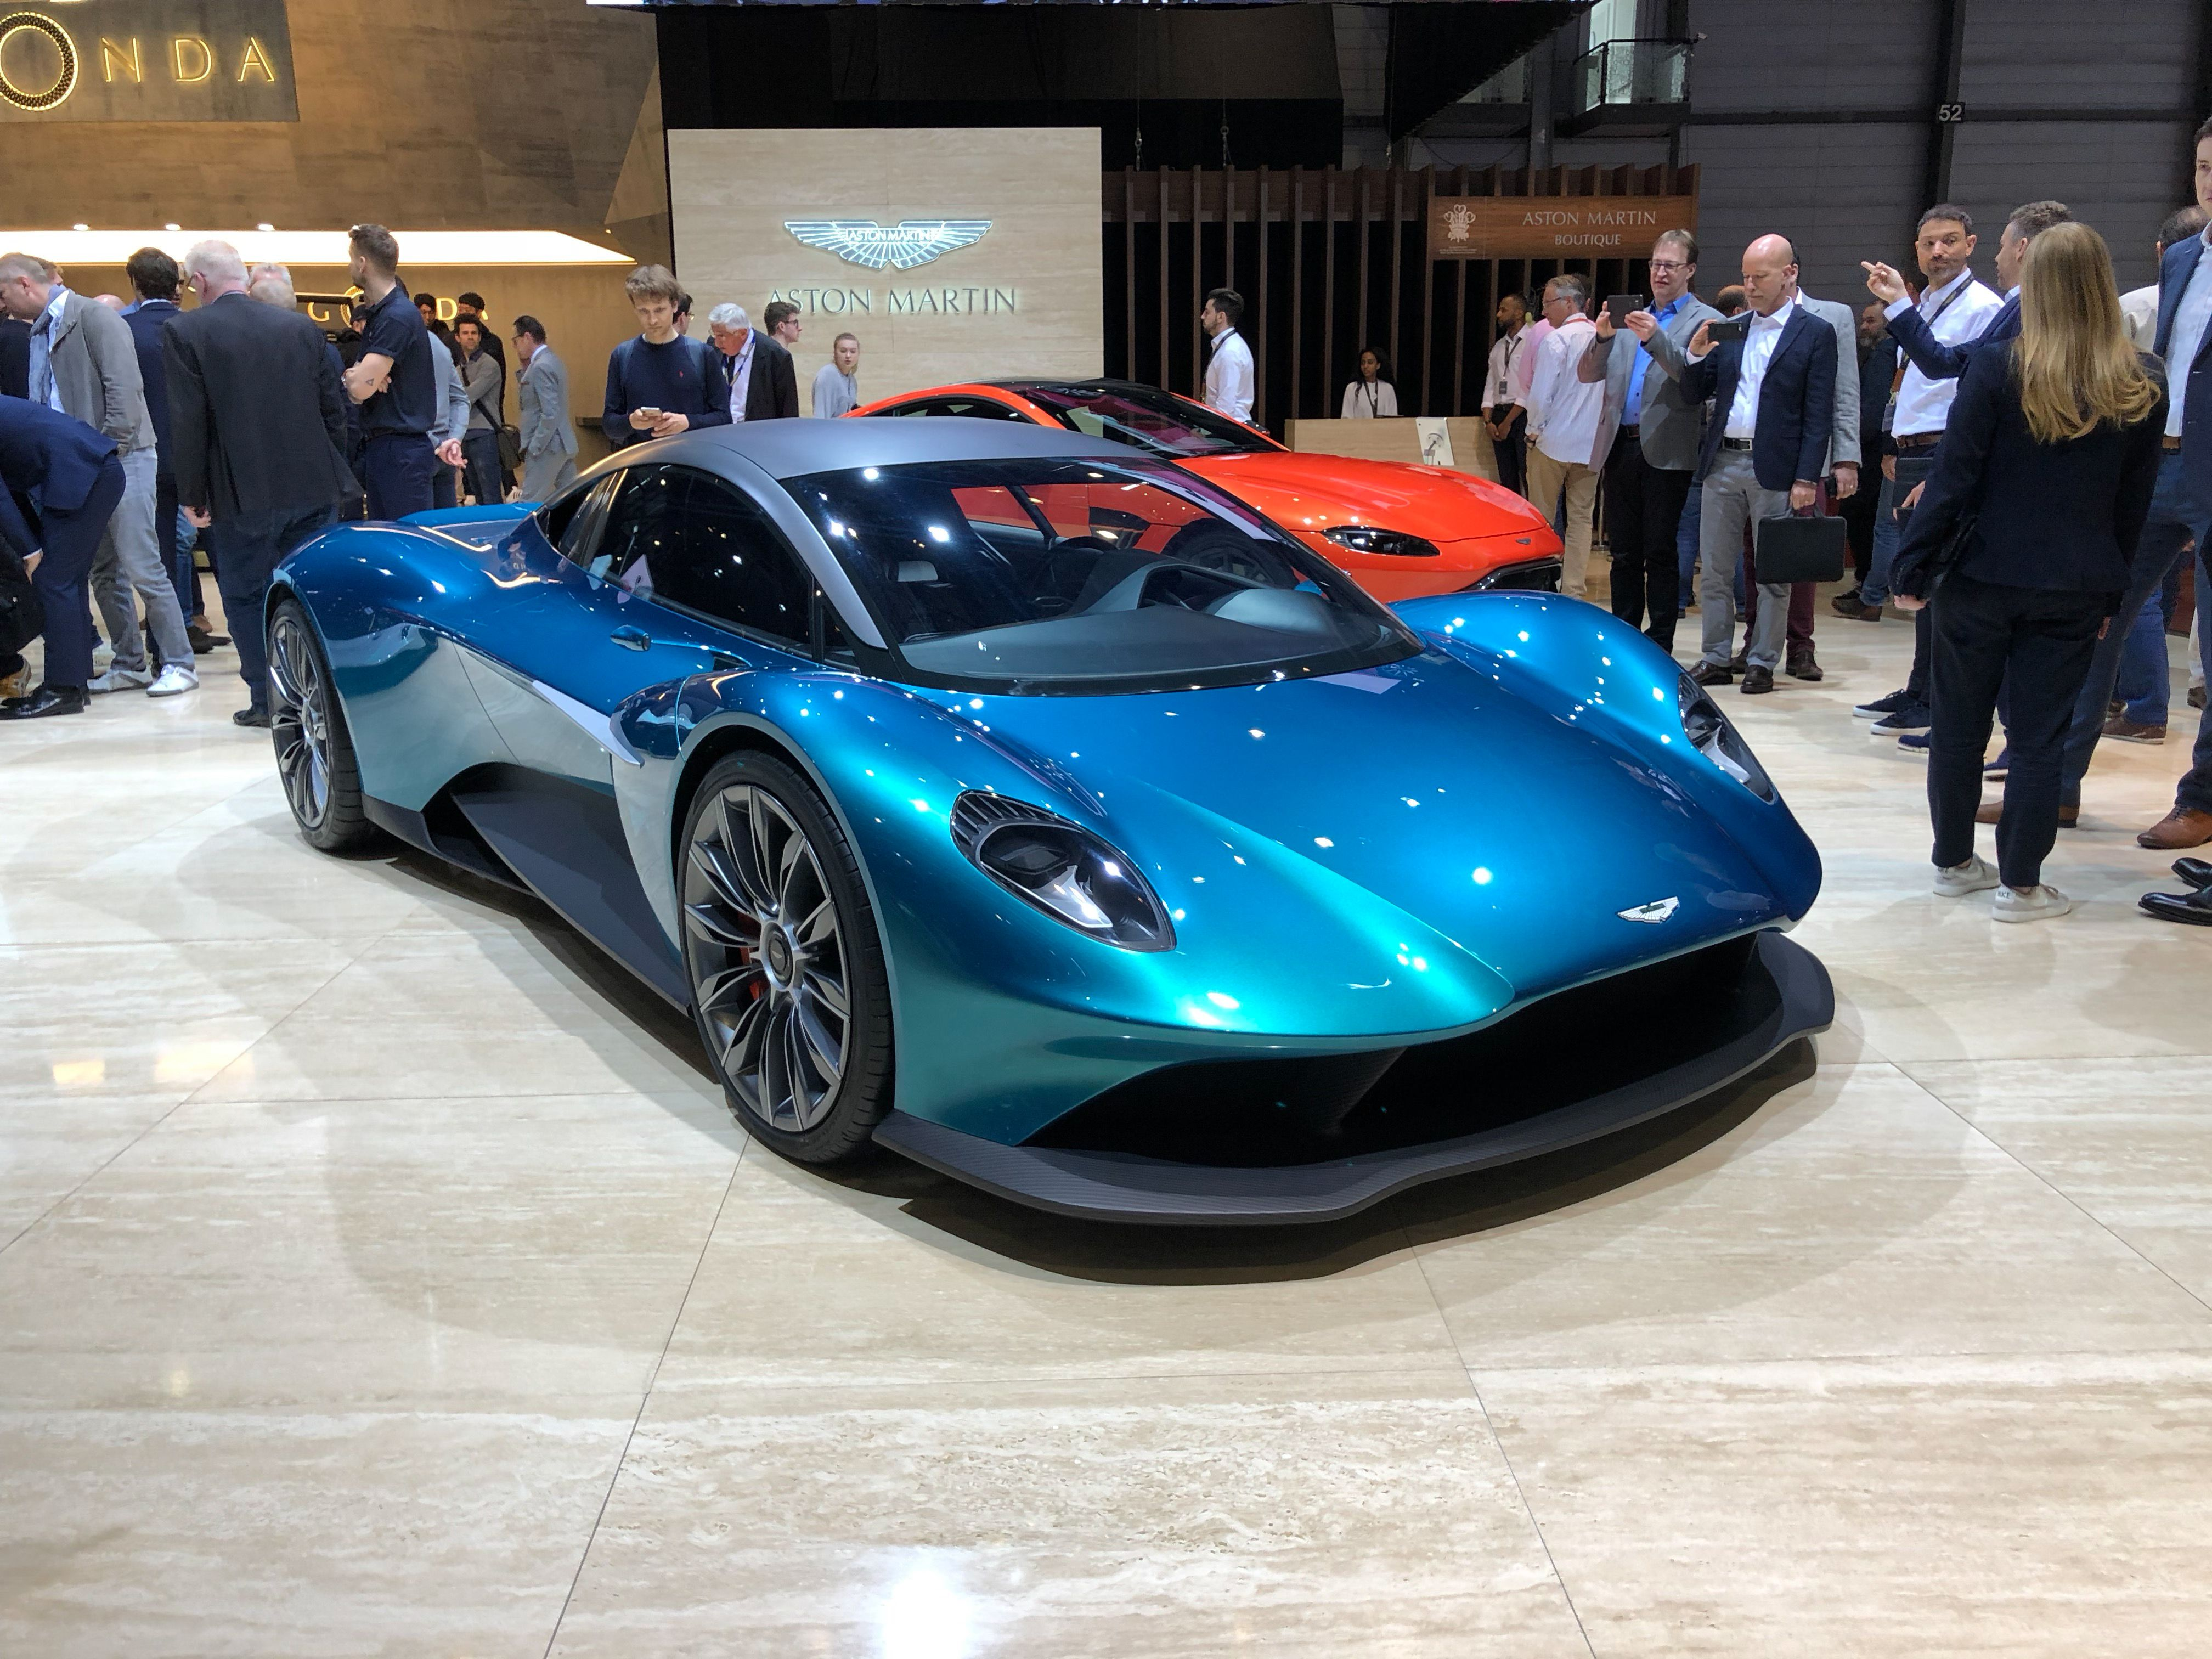 Aston Martin Vanquish Vision Concept Has Ferrari And Mclaren In Its Sights